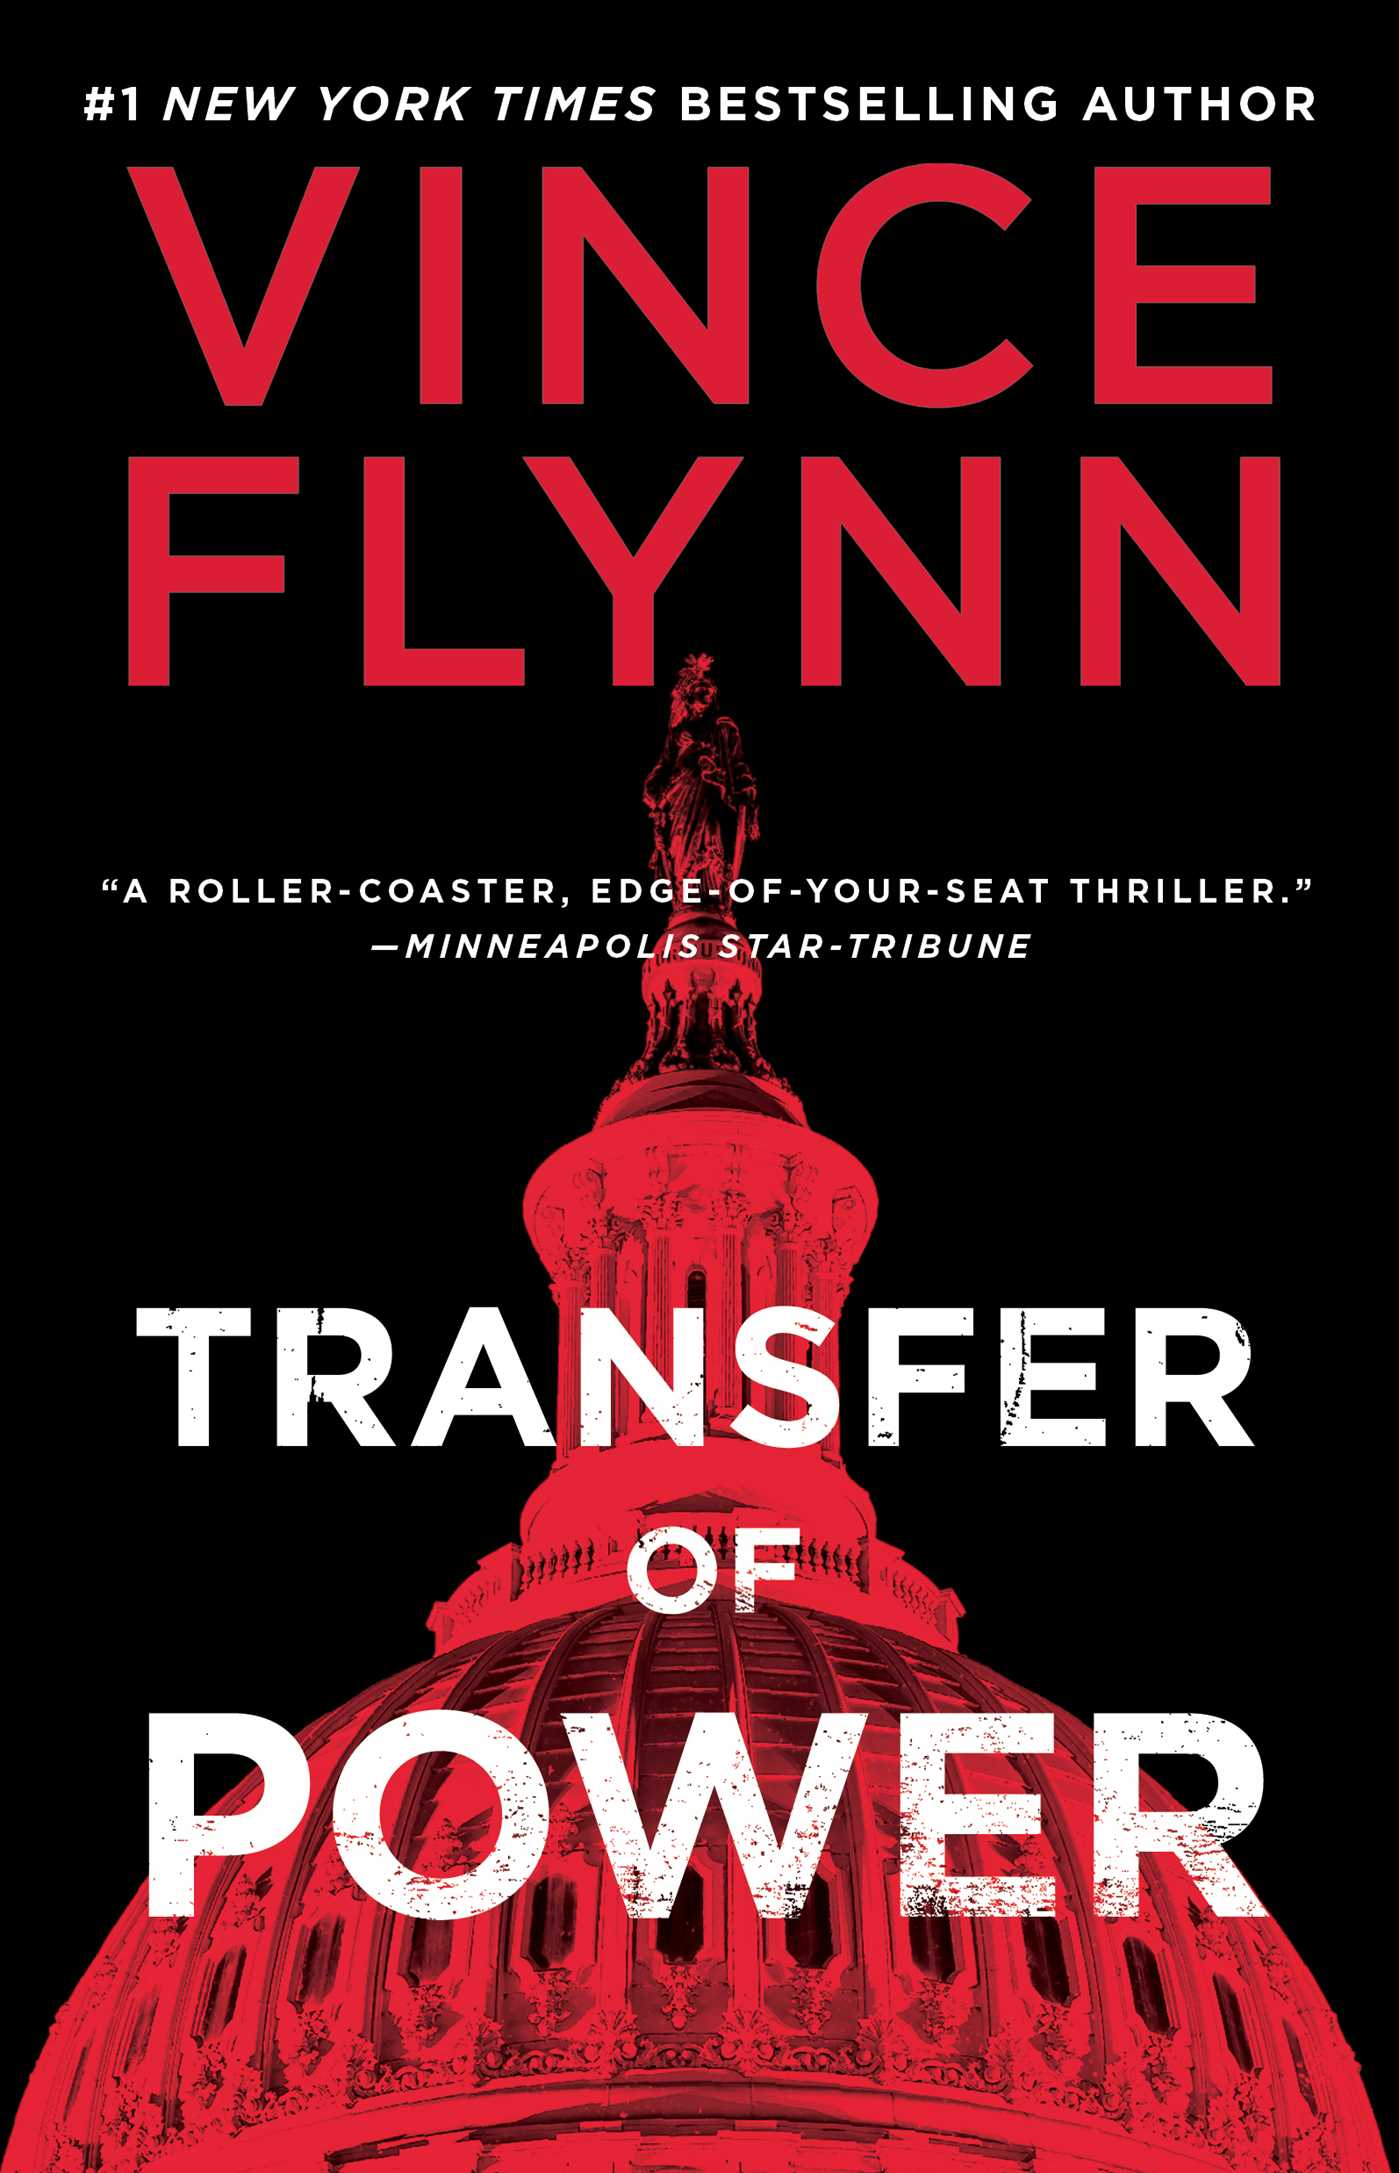 Transfer of power 9780743449243 hr